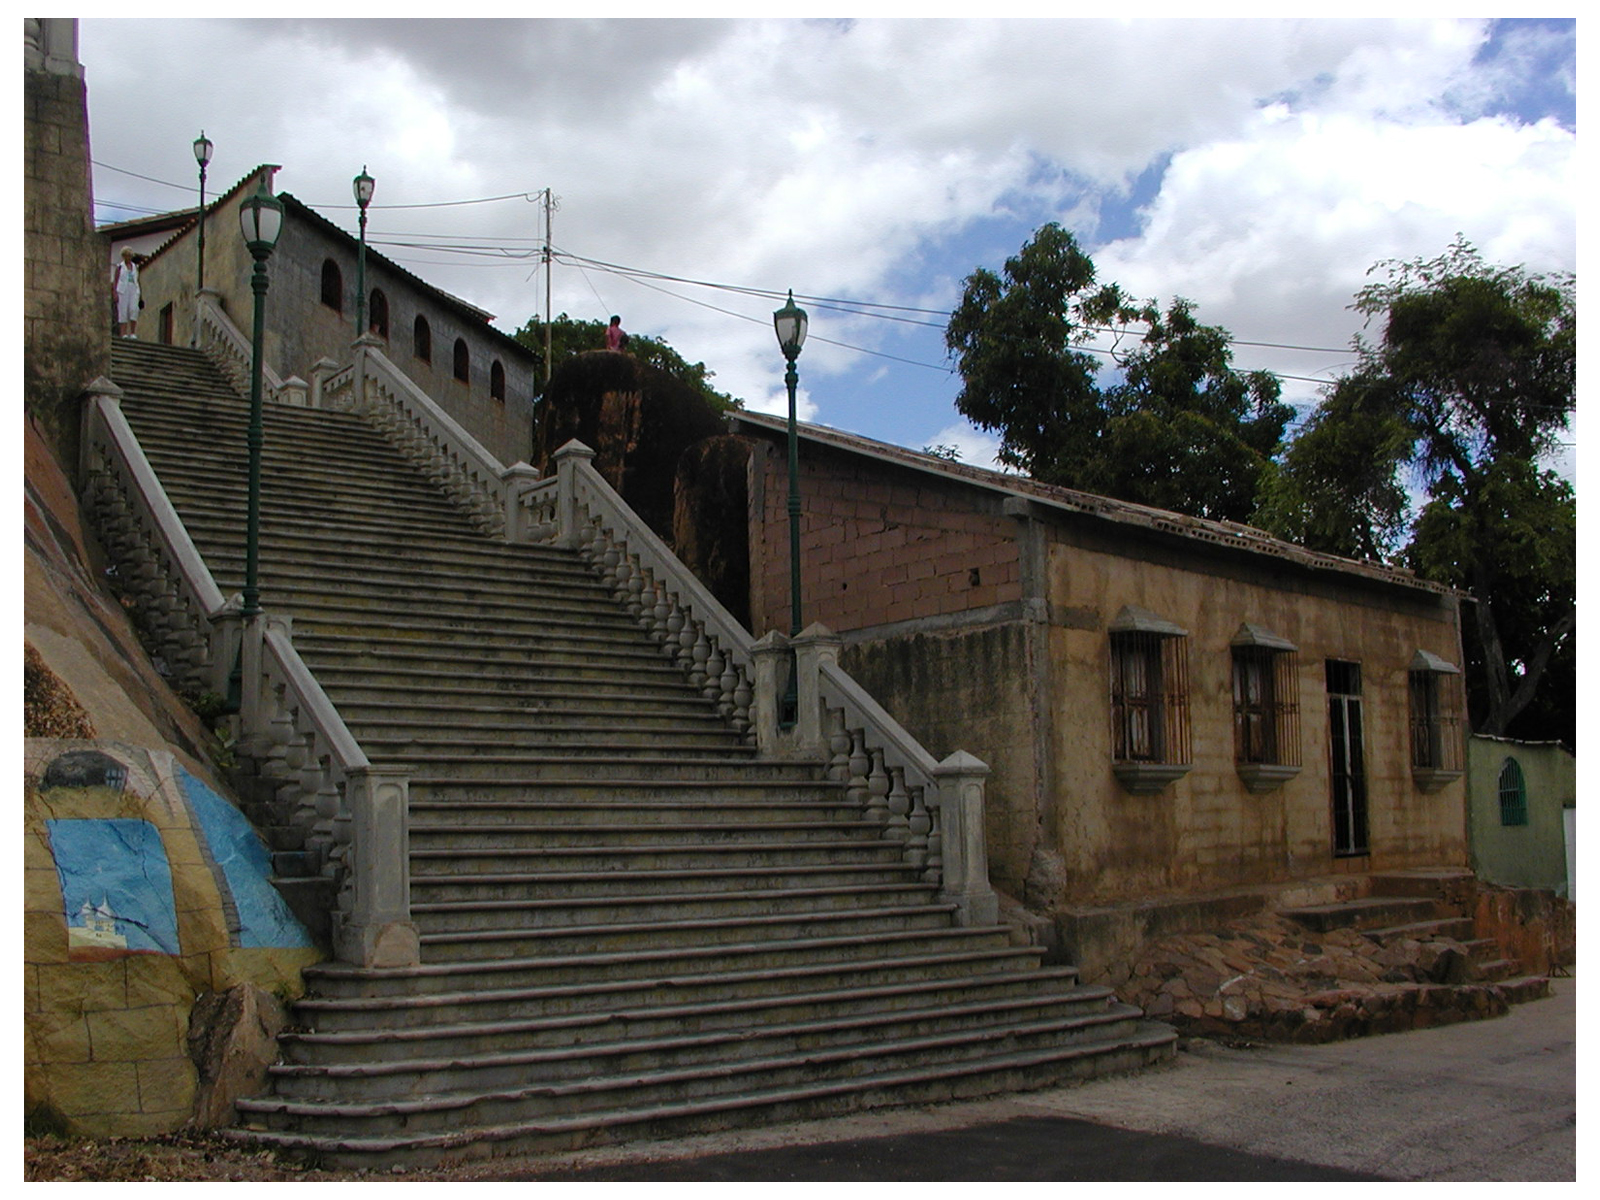 Staircase in Bolivar